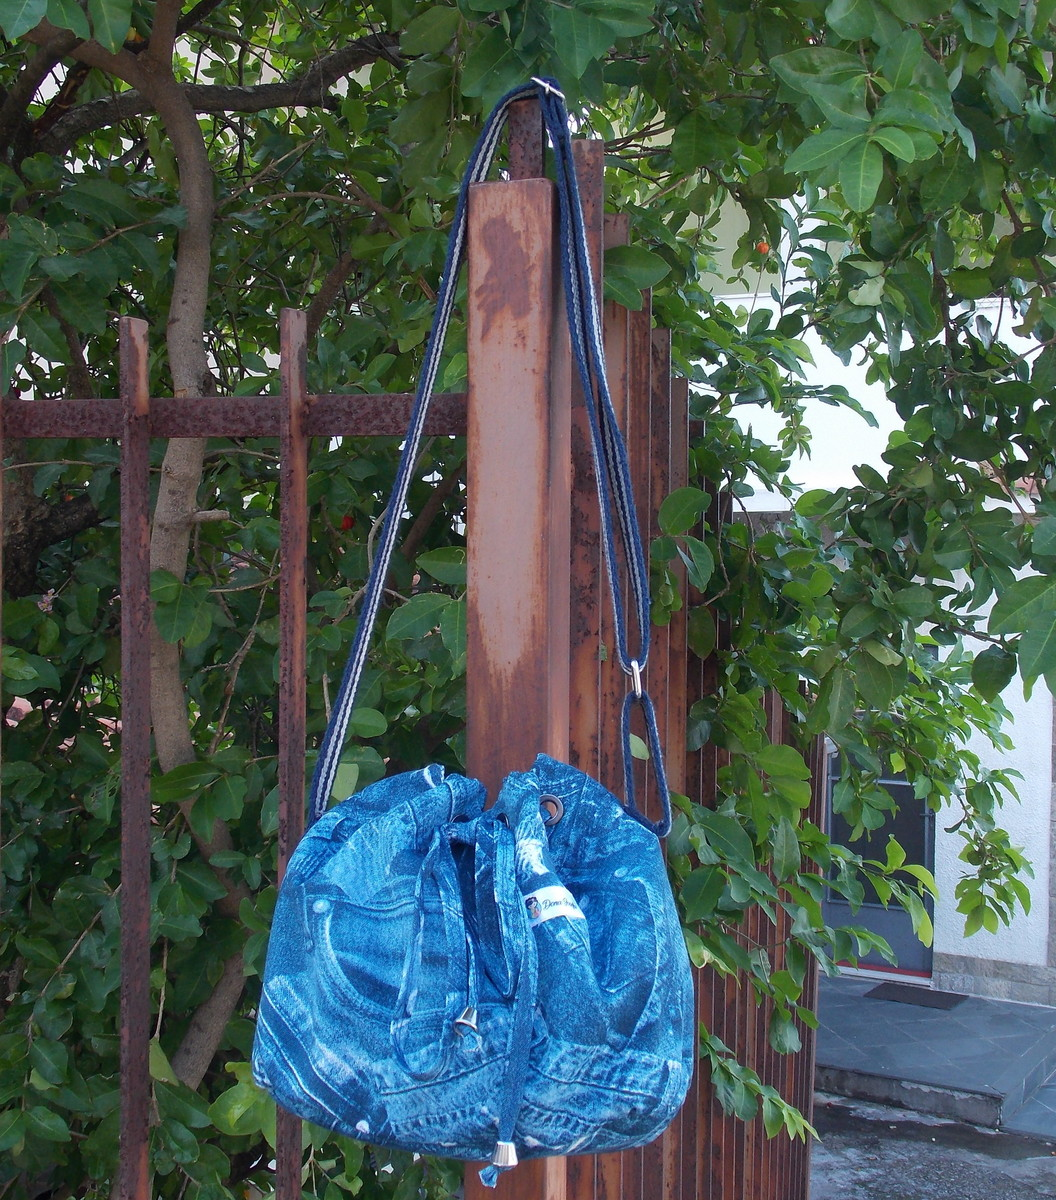 77f4bc9c9 Bolsa Saco Jeans - Bucket Bag (alça azul) no Elo7 | Dona Josefa (BE313A)